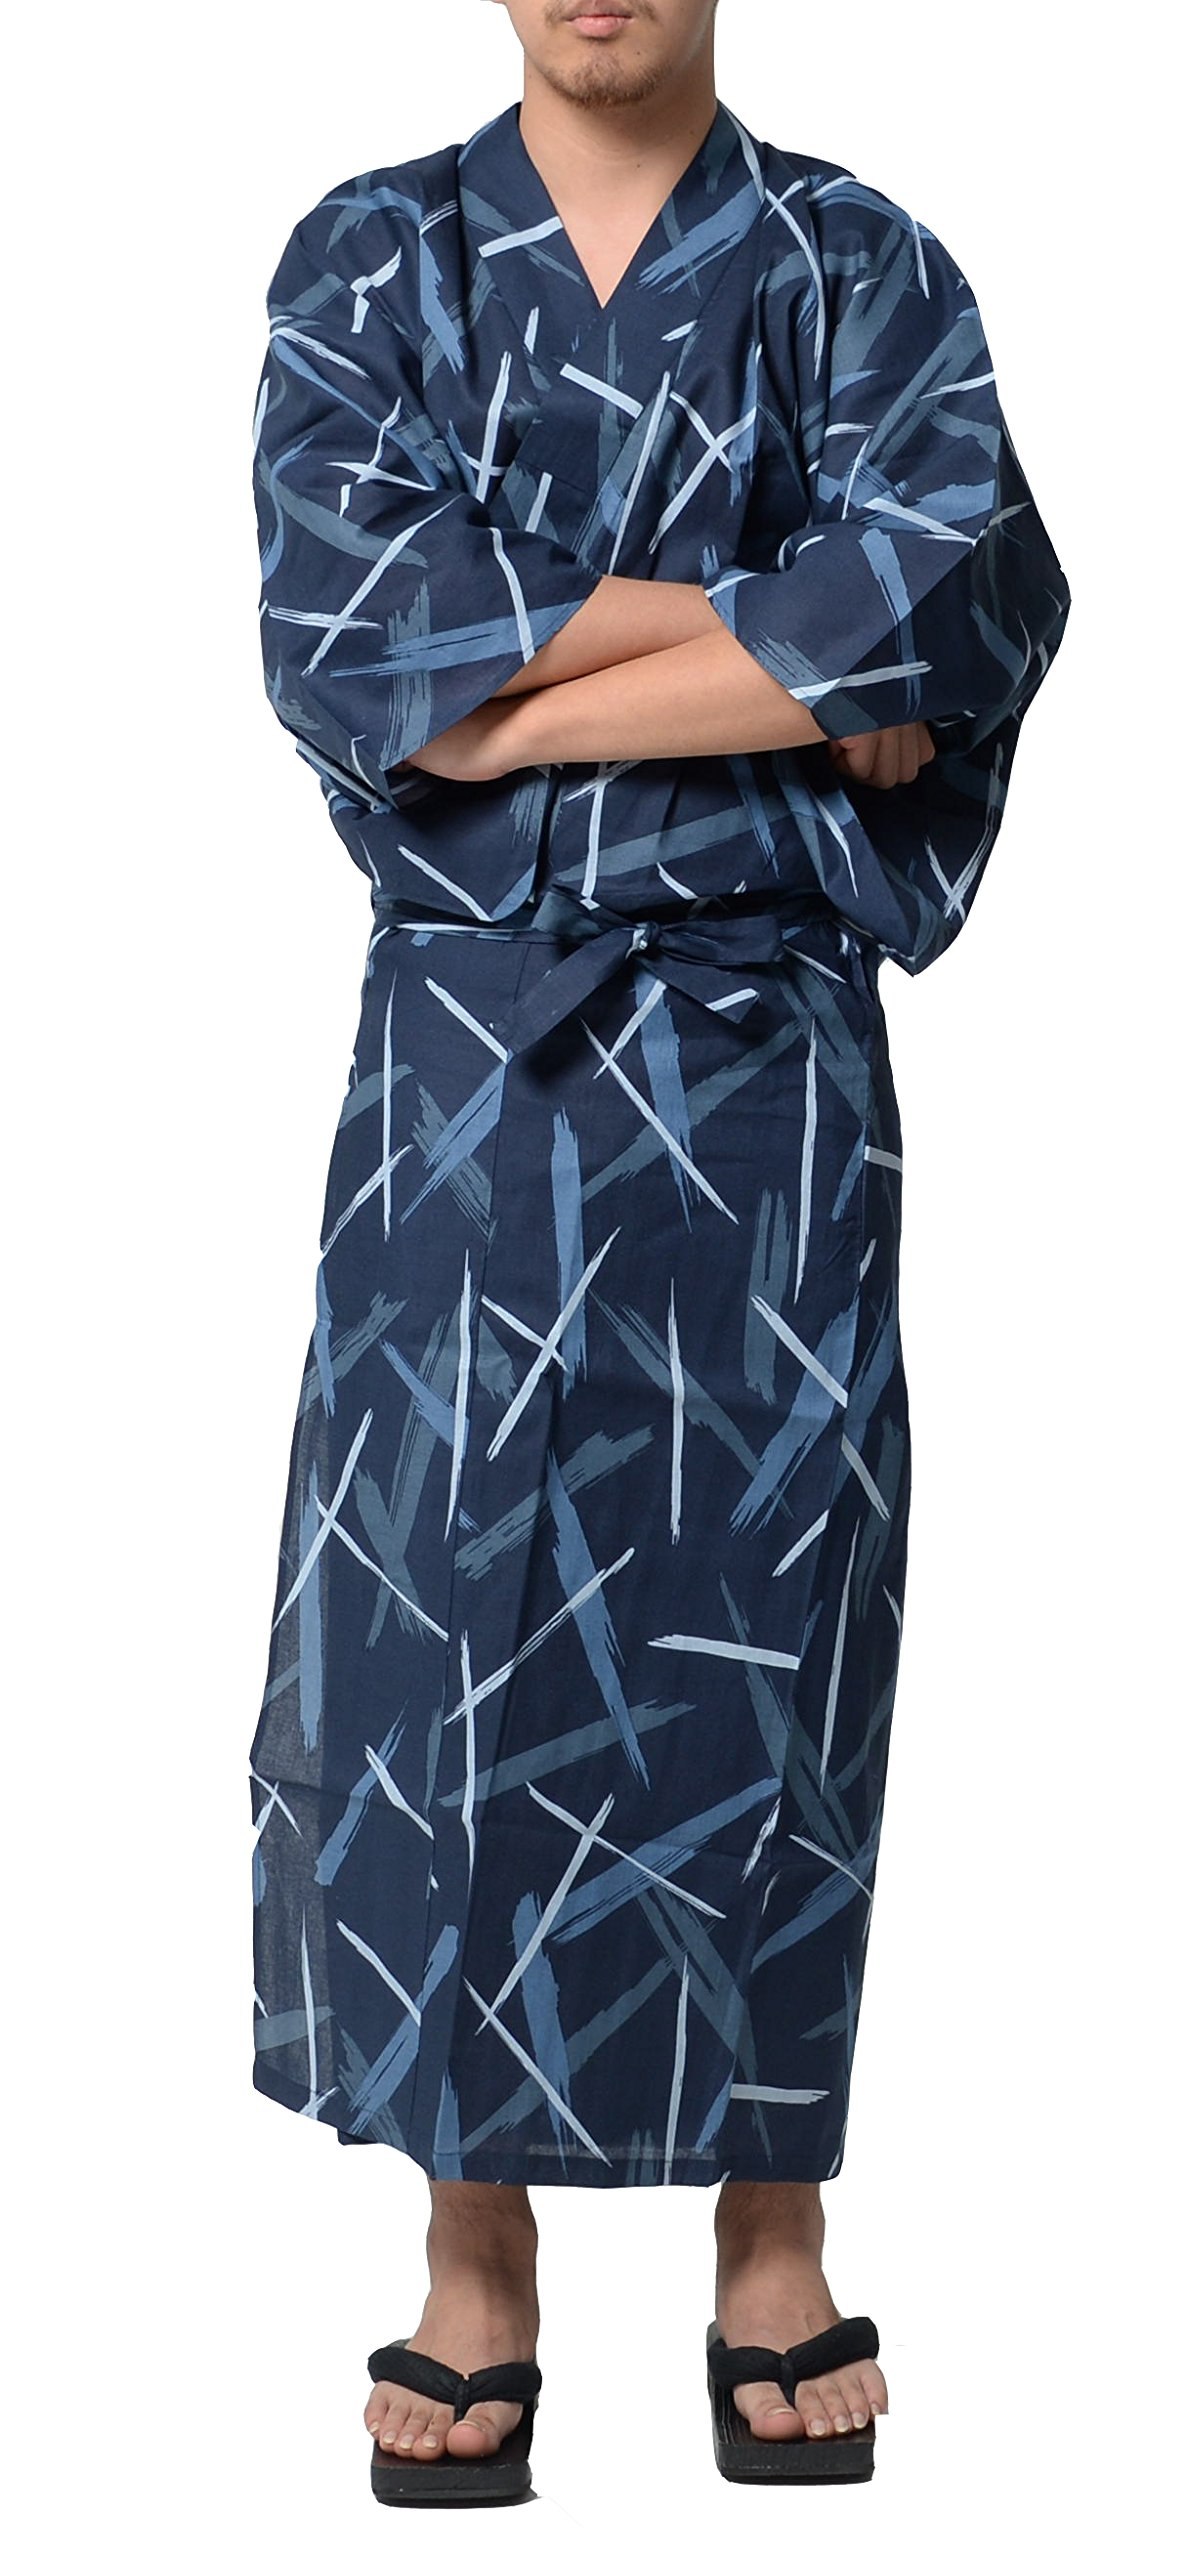 Wako Men's Traditional Easy Wearing Japan Cotton Yukata Robe(Japan Cotton ese Casual Kimono) Gentle Breeze X-Large Men